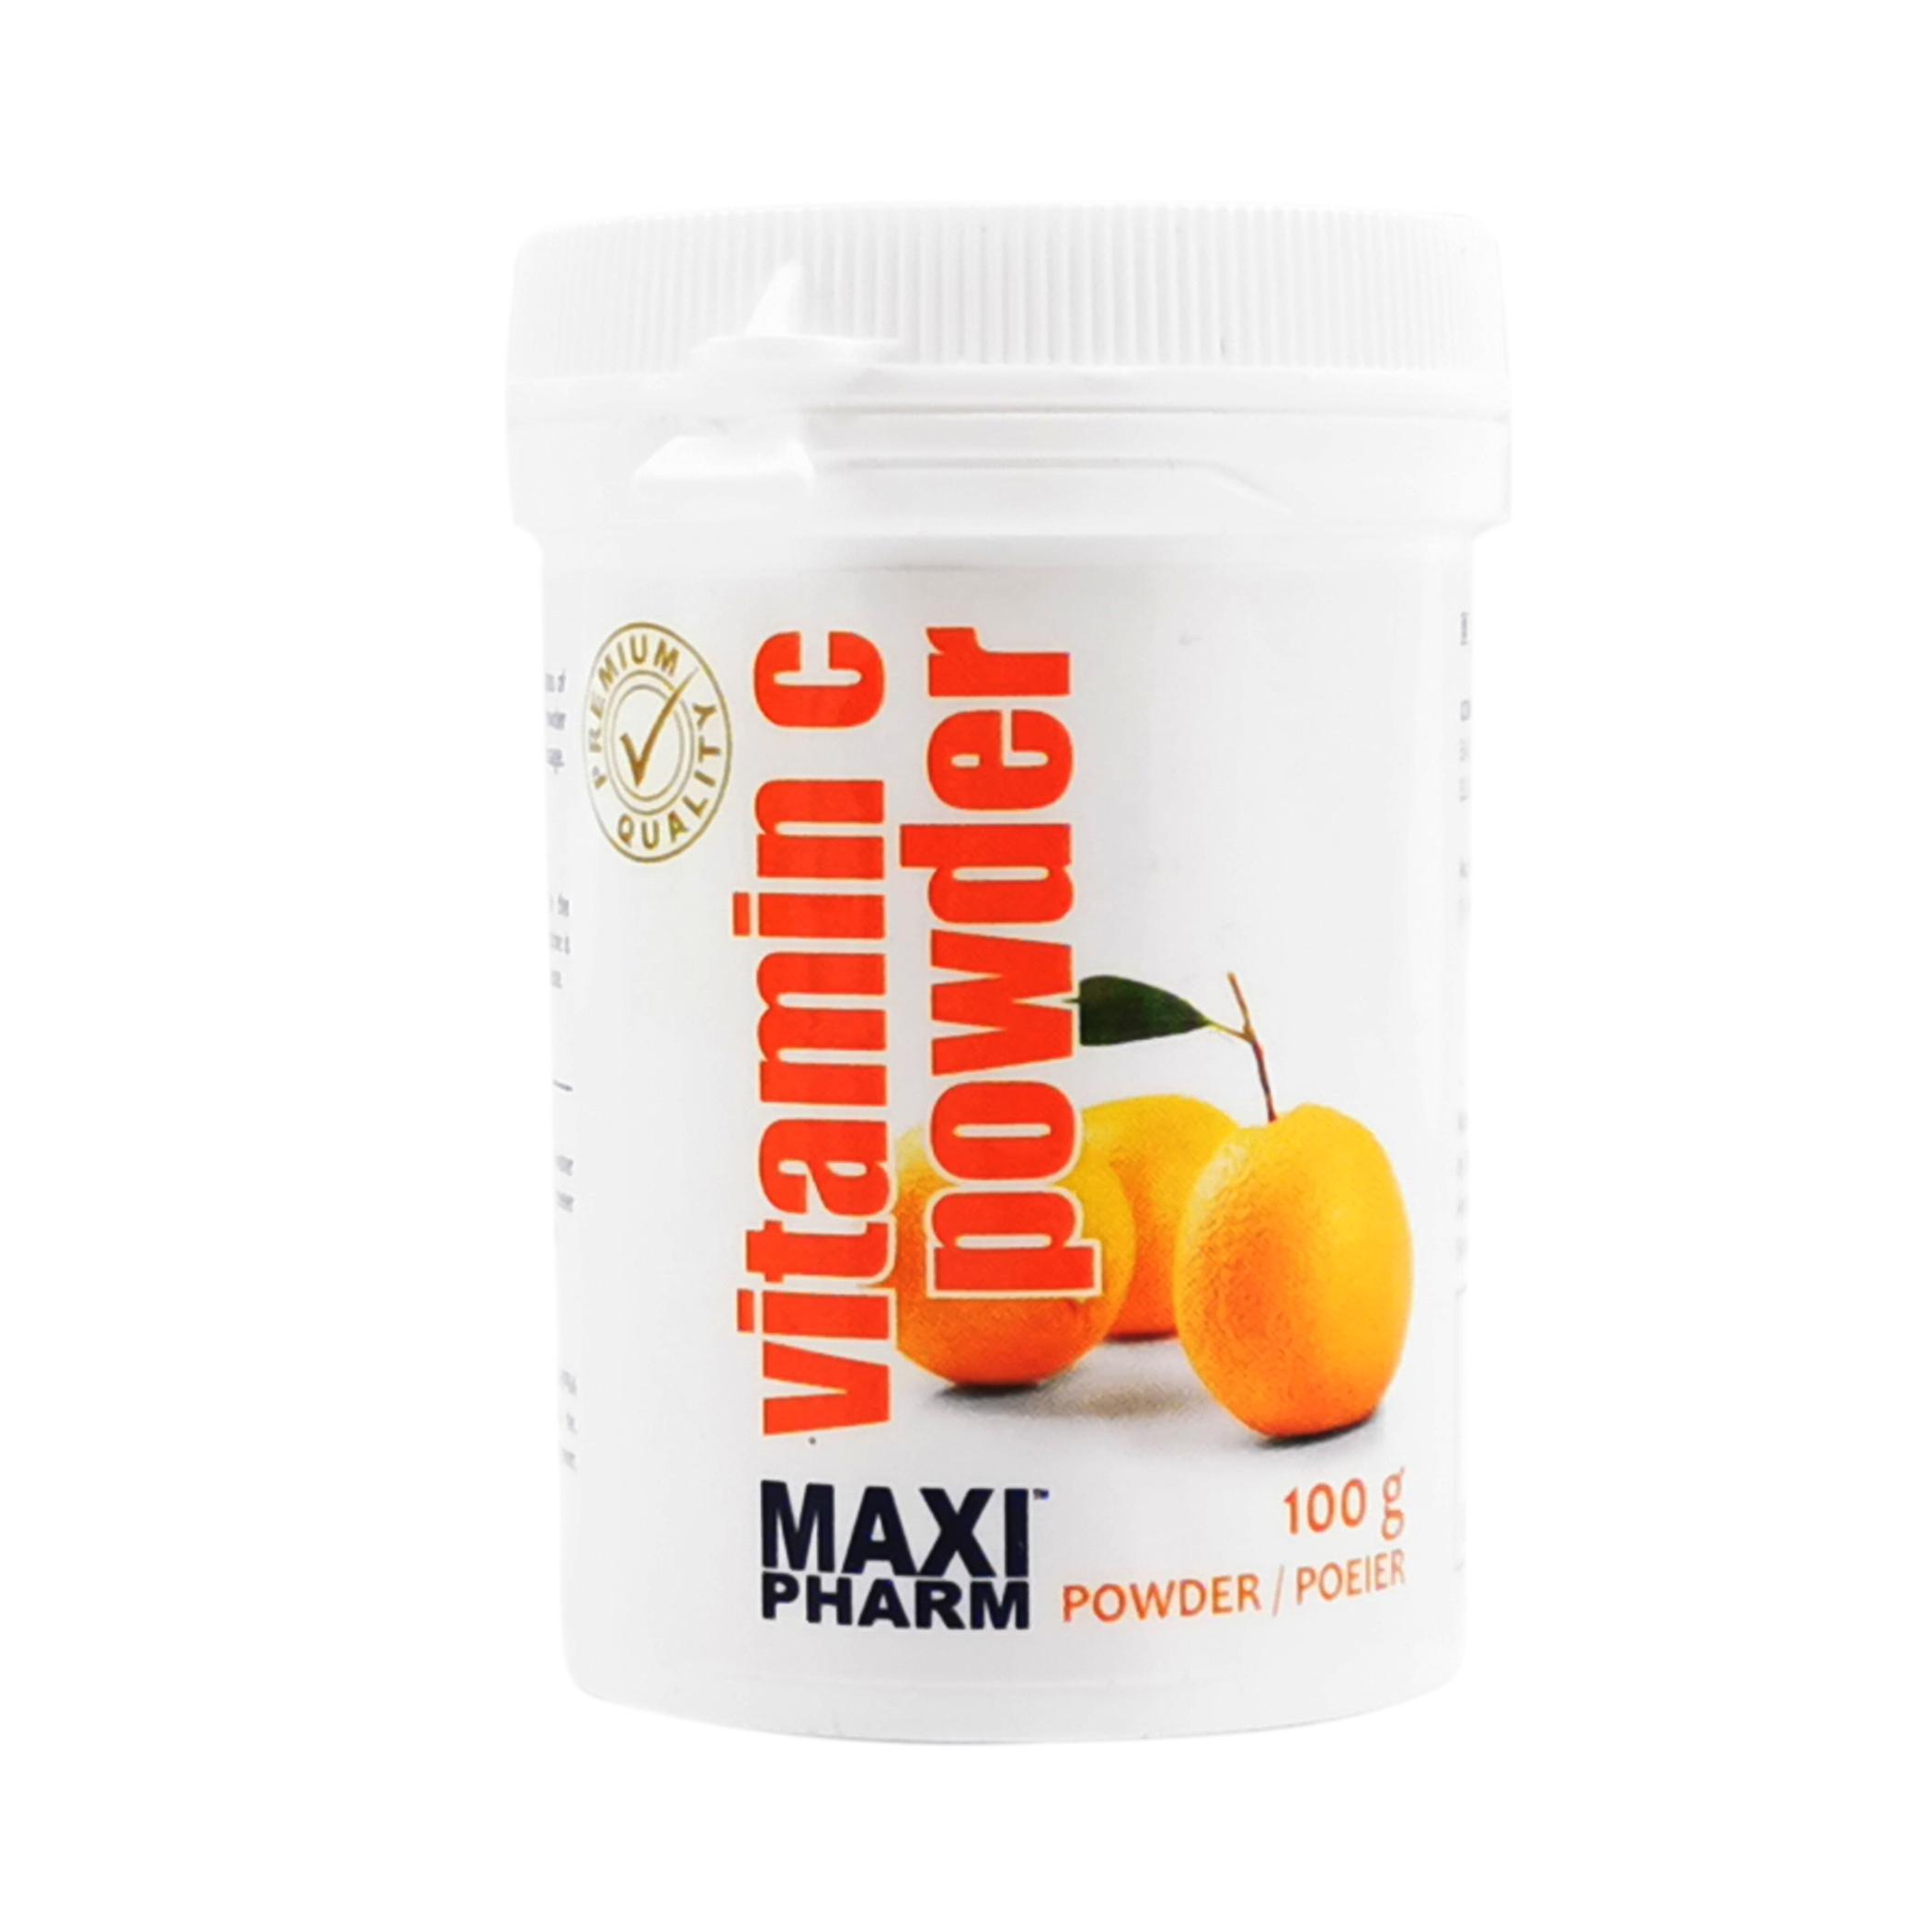 https://campaign-image.com/zohocampaigns/673524000004072018_zc_v119_1626780487493_maxipharm_vitamin_c_powder_100g_powder_1x1.jpg